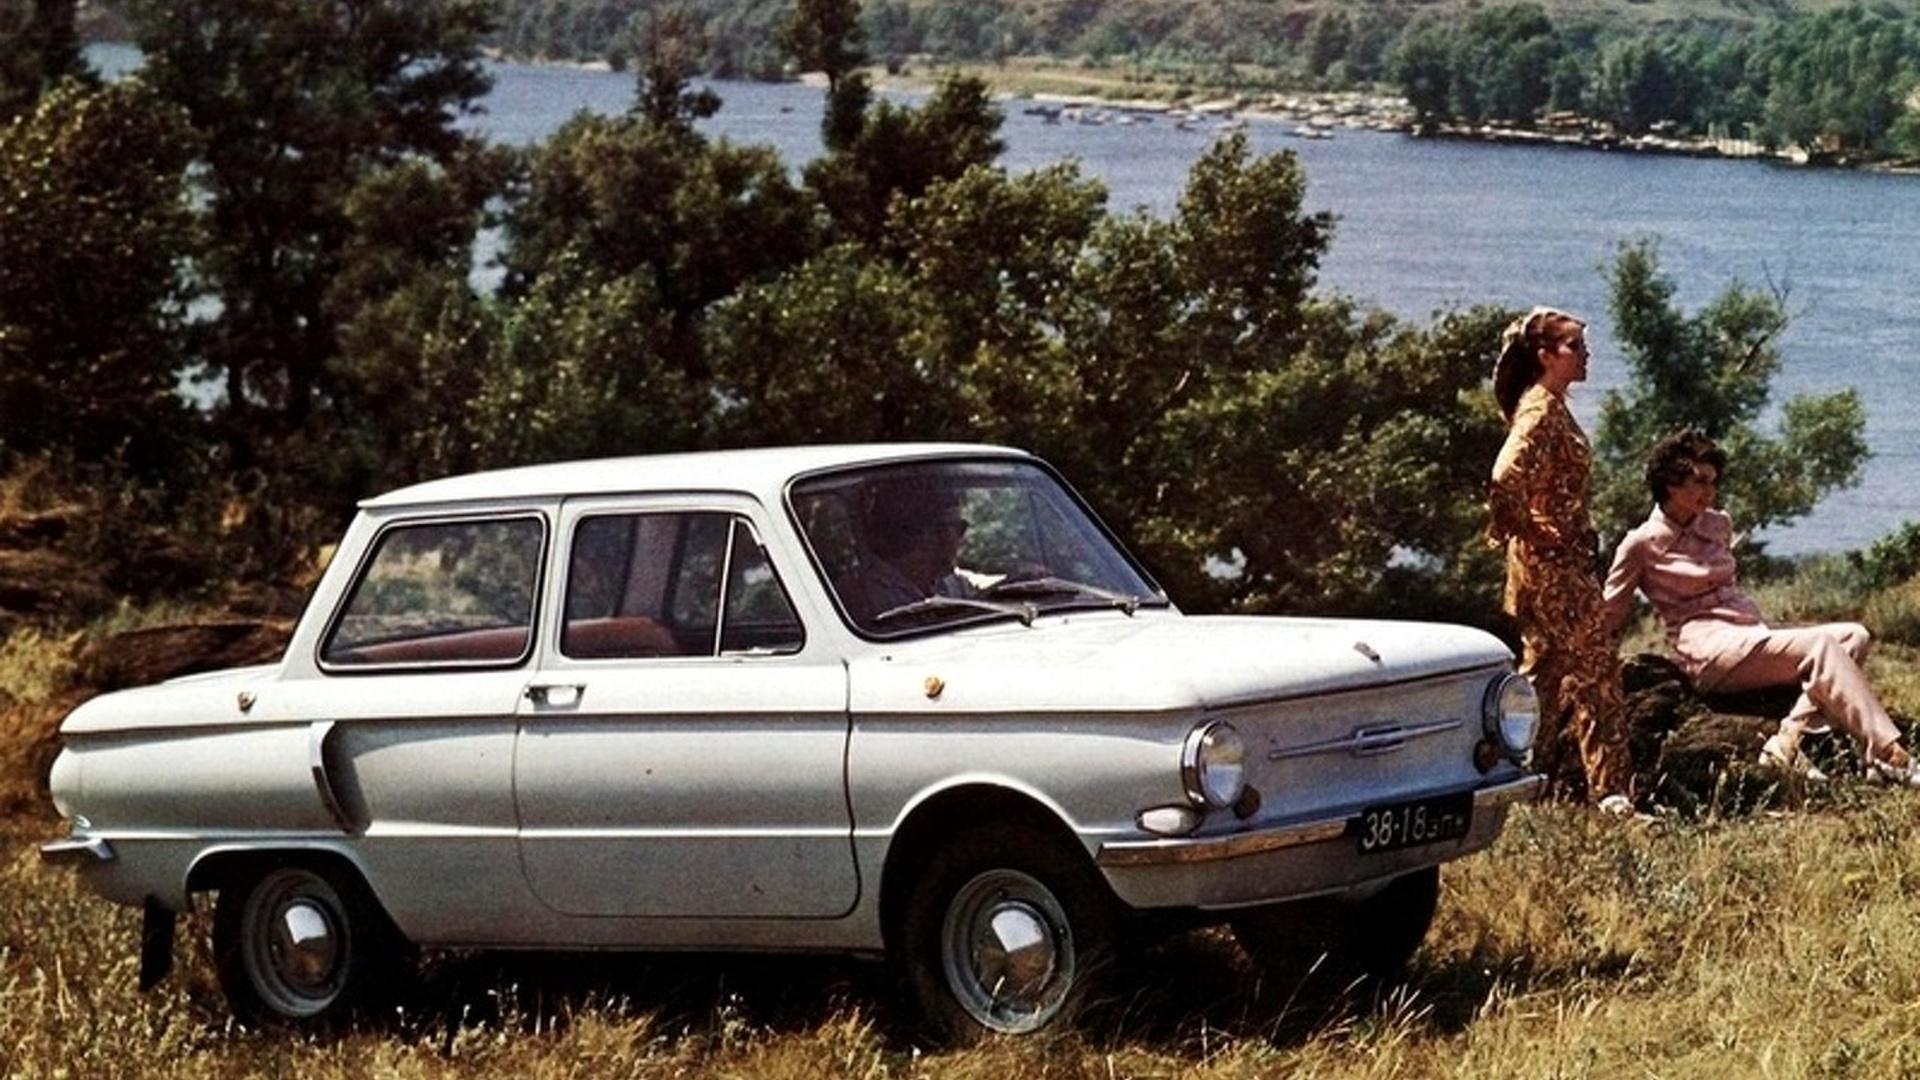 AUTO.RIA – Отзыв ЗАЗ 968 1992 года от makro2007 2014-11-26 | 1080x1920